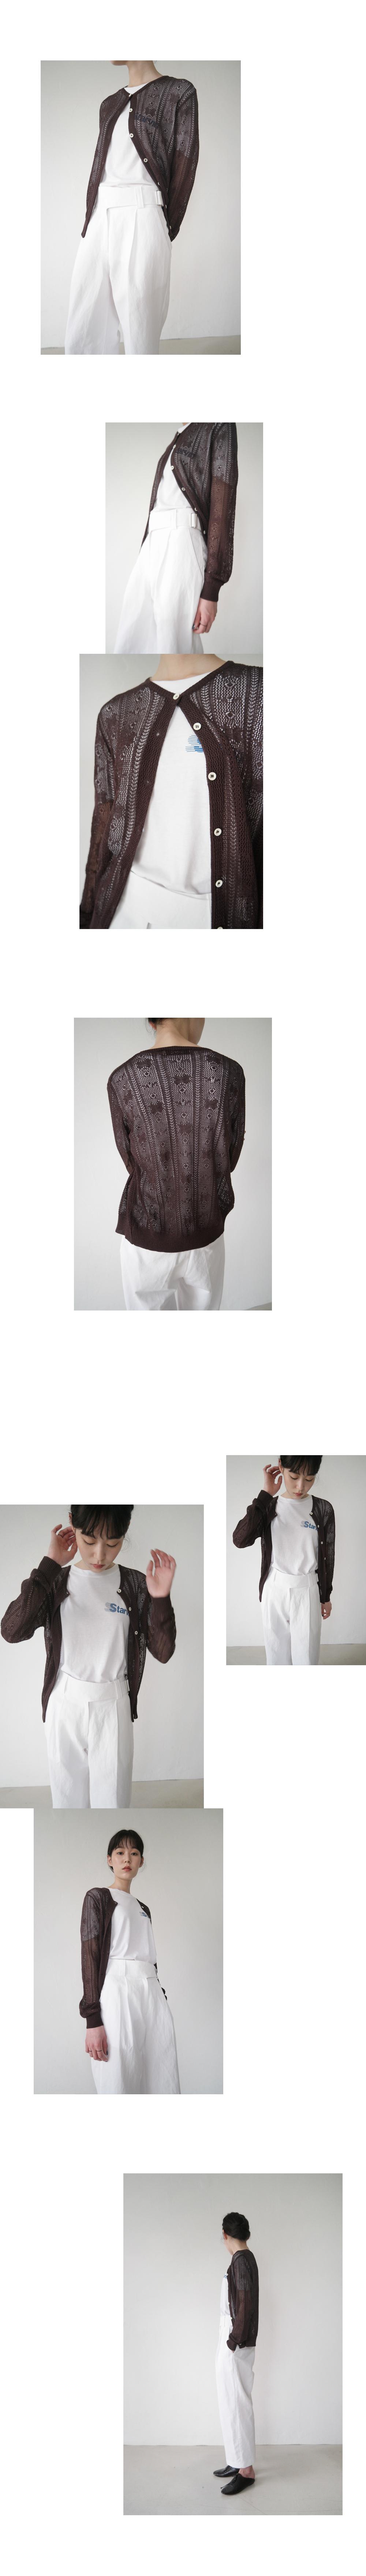 flower knitting cardigan (3colors)